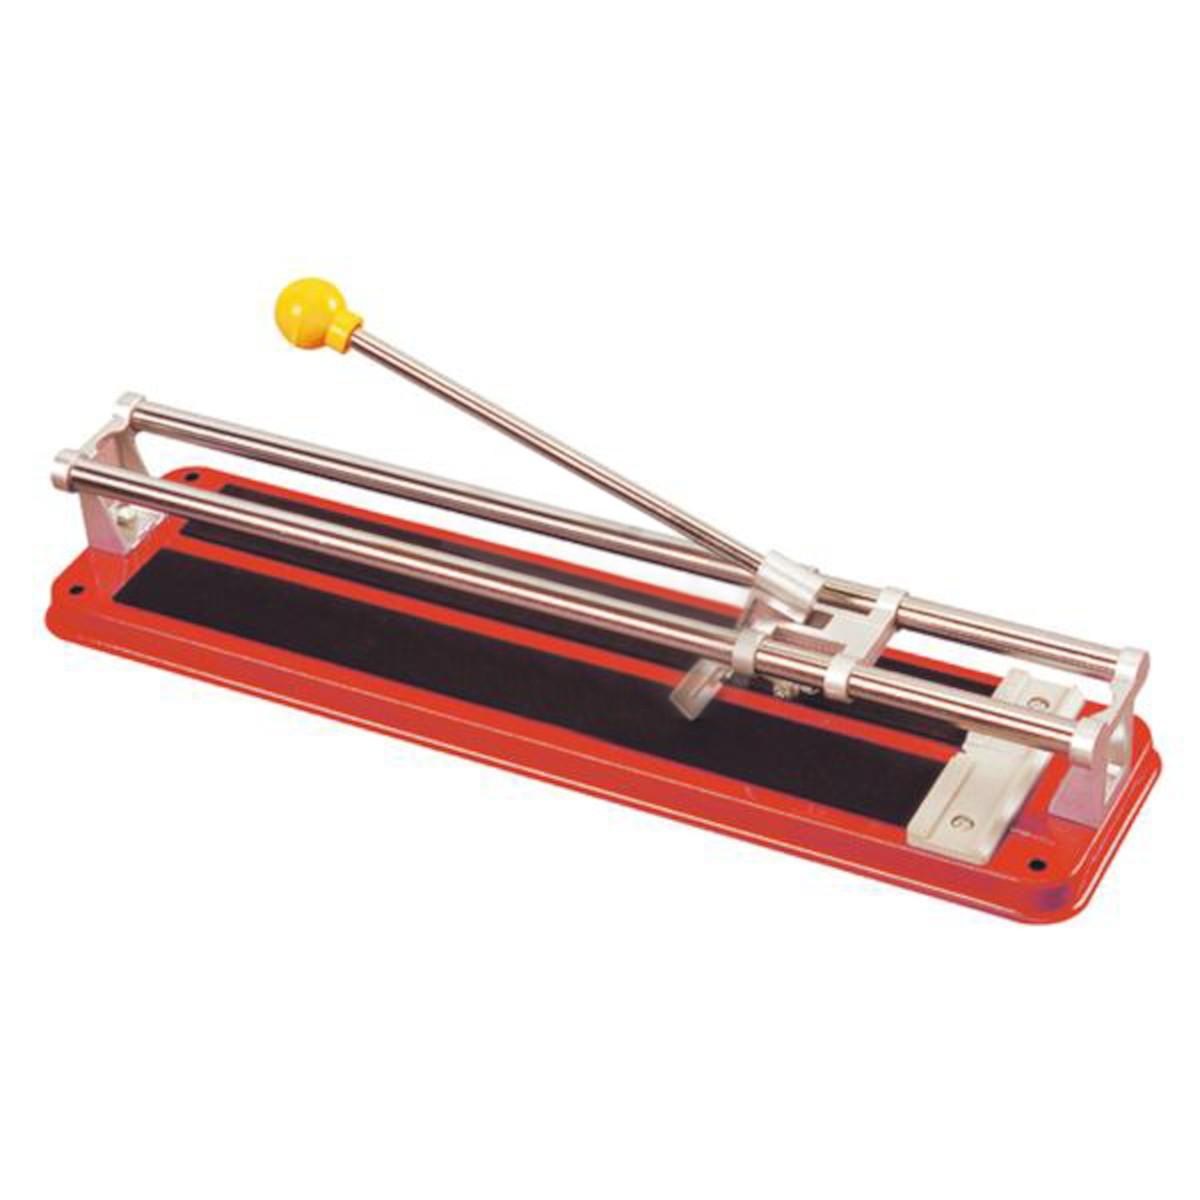 Rezačka Multi Tools Eko délka řezu 40 cm R40EKO